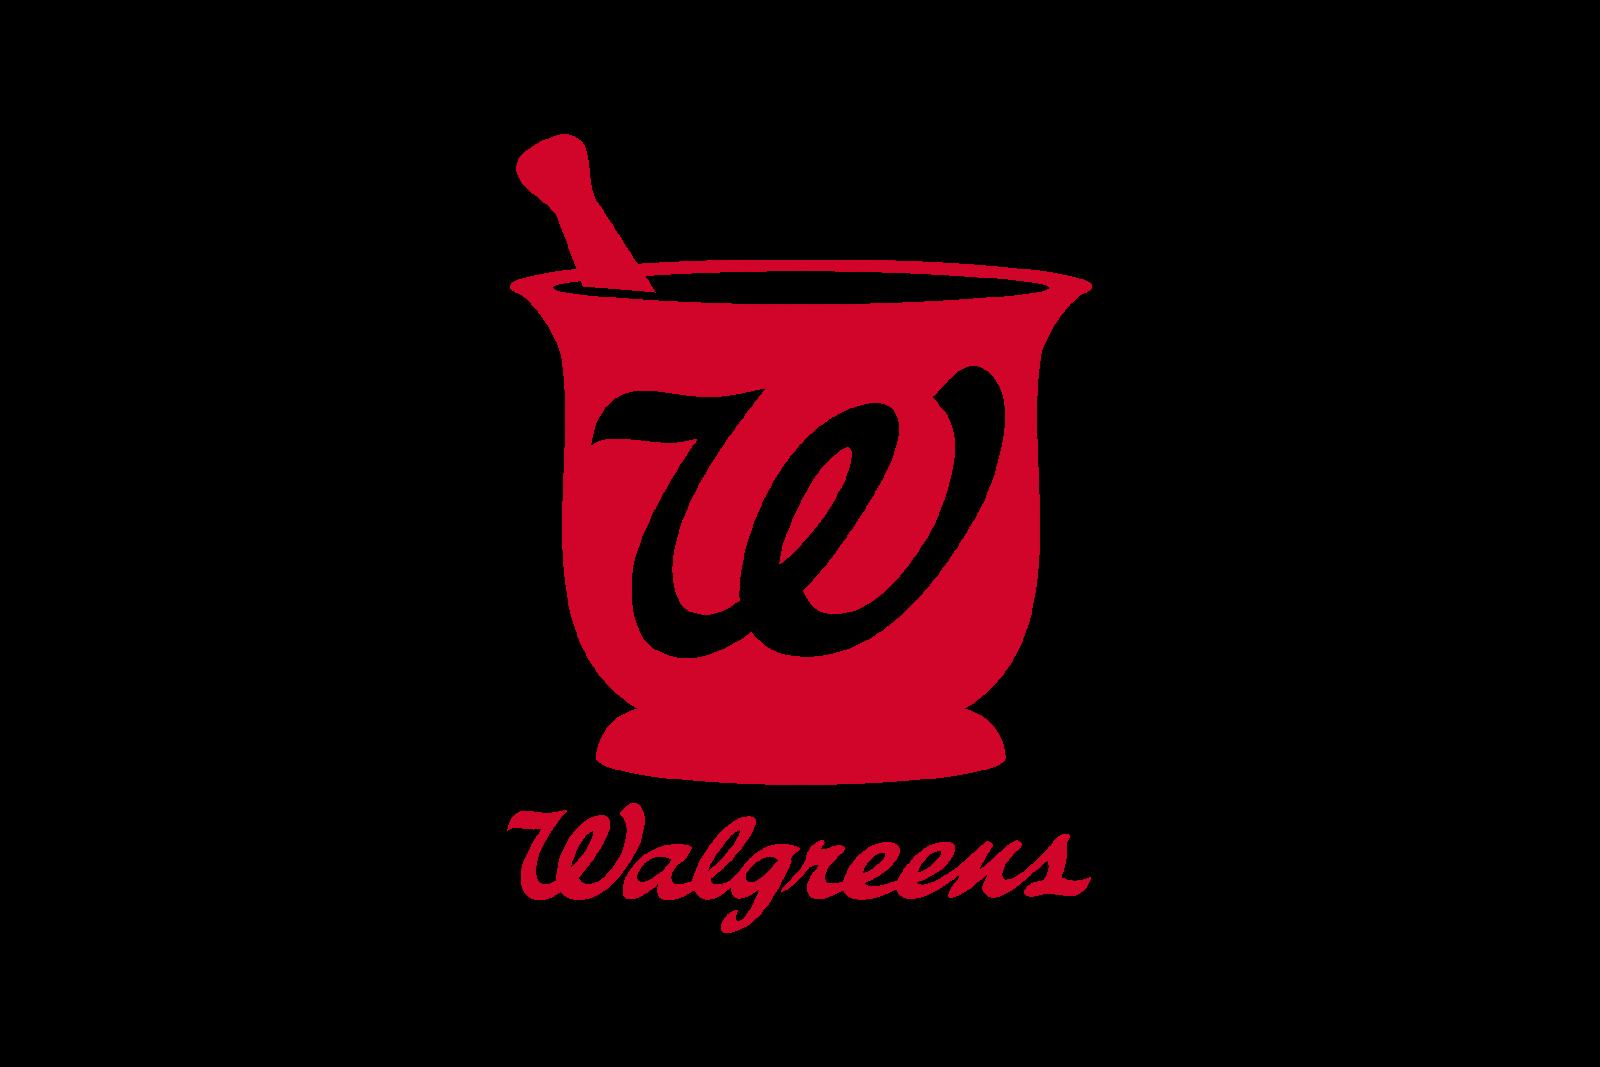 walgreens logo rh logo share blogspot com